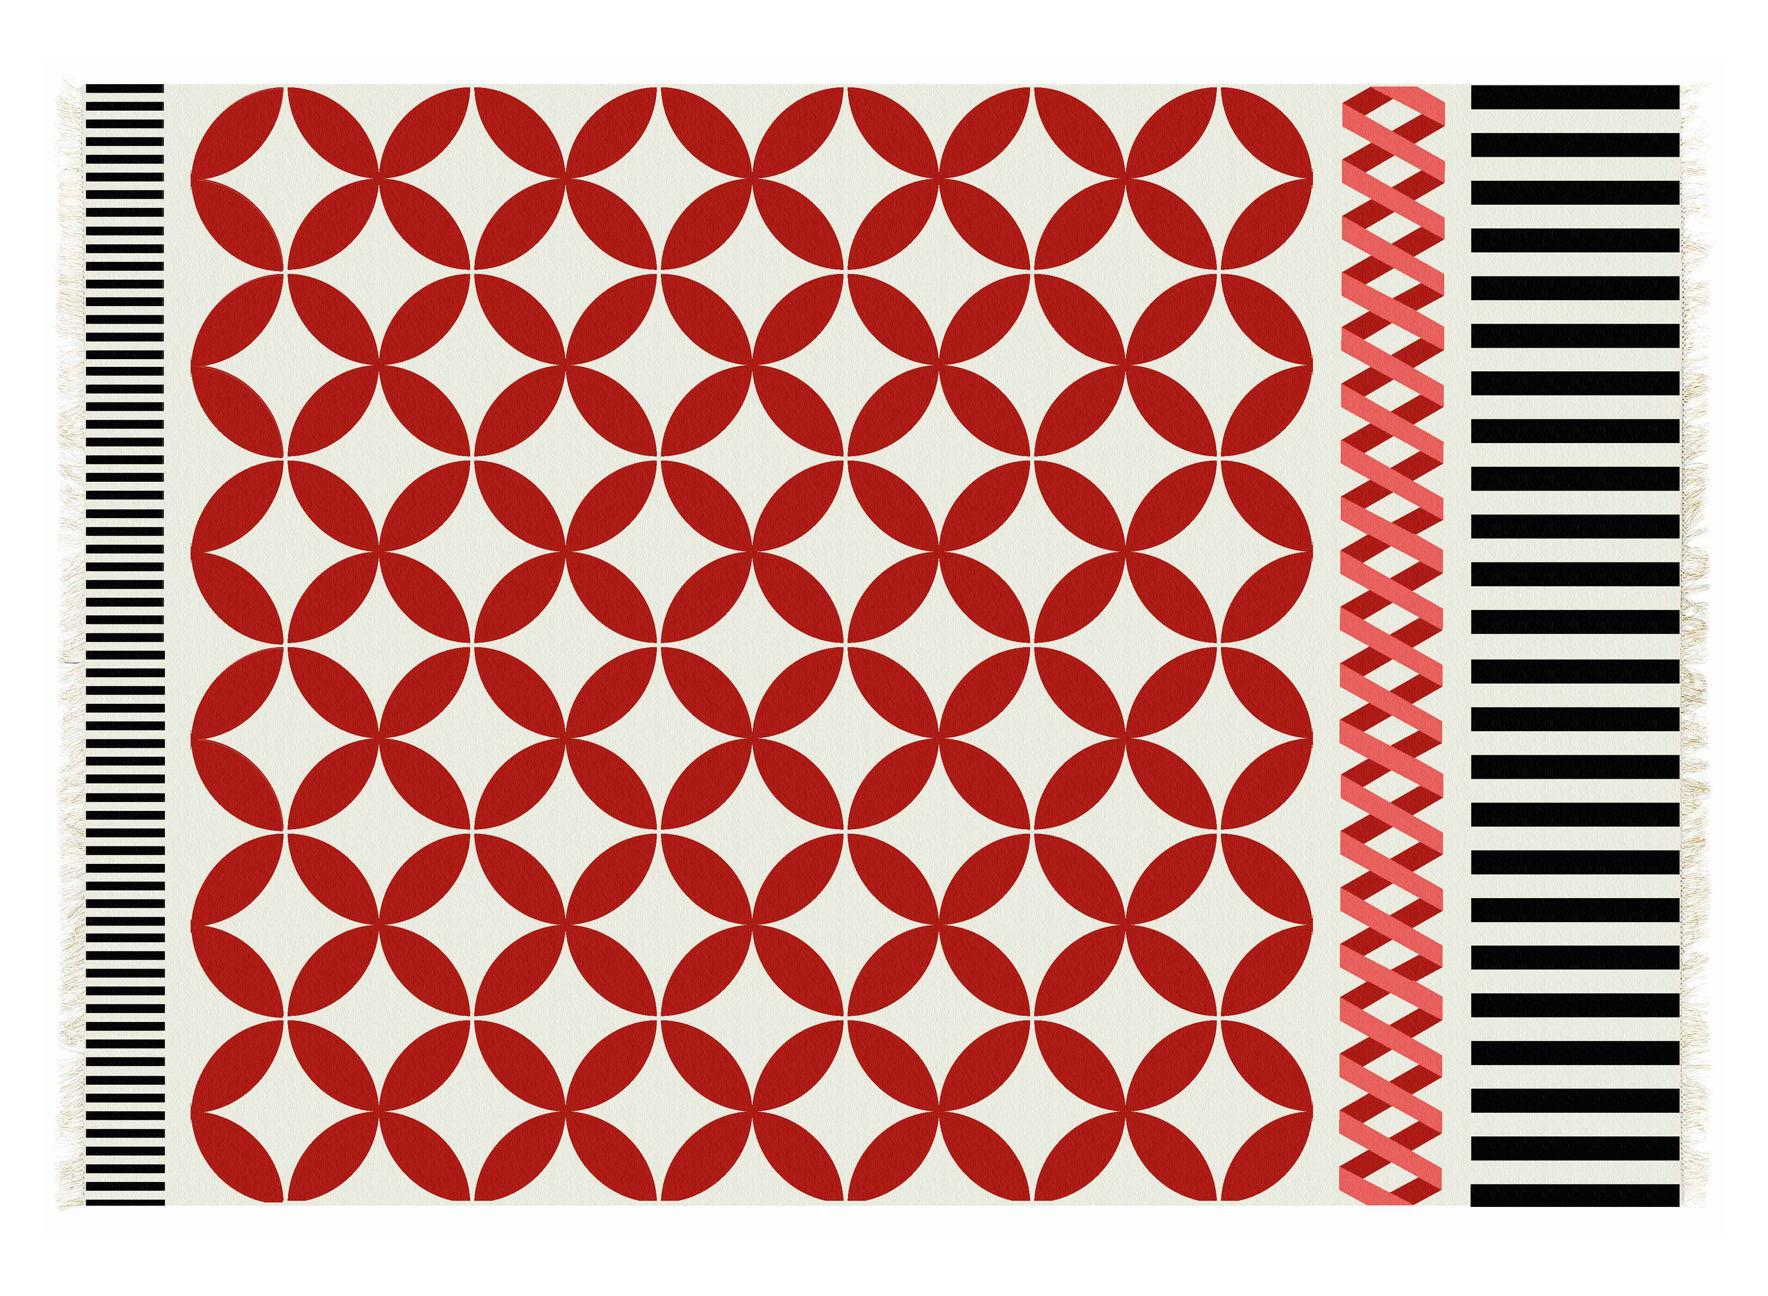 Decoration - Rugs - Kilim Catania Rug - / 240 x 170 cm by Gan - Red - Virgin wool